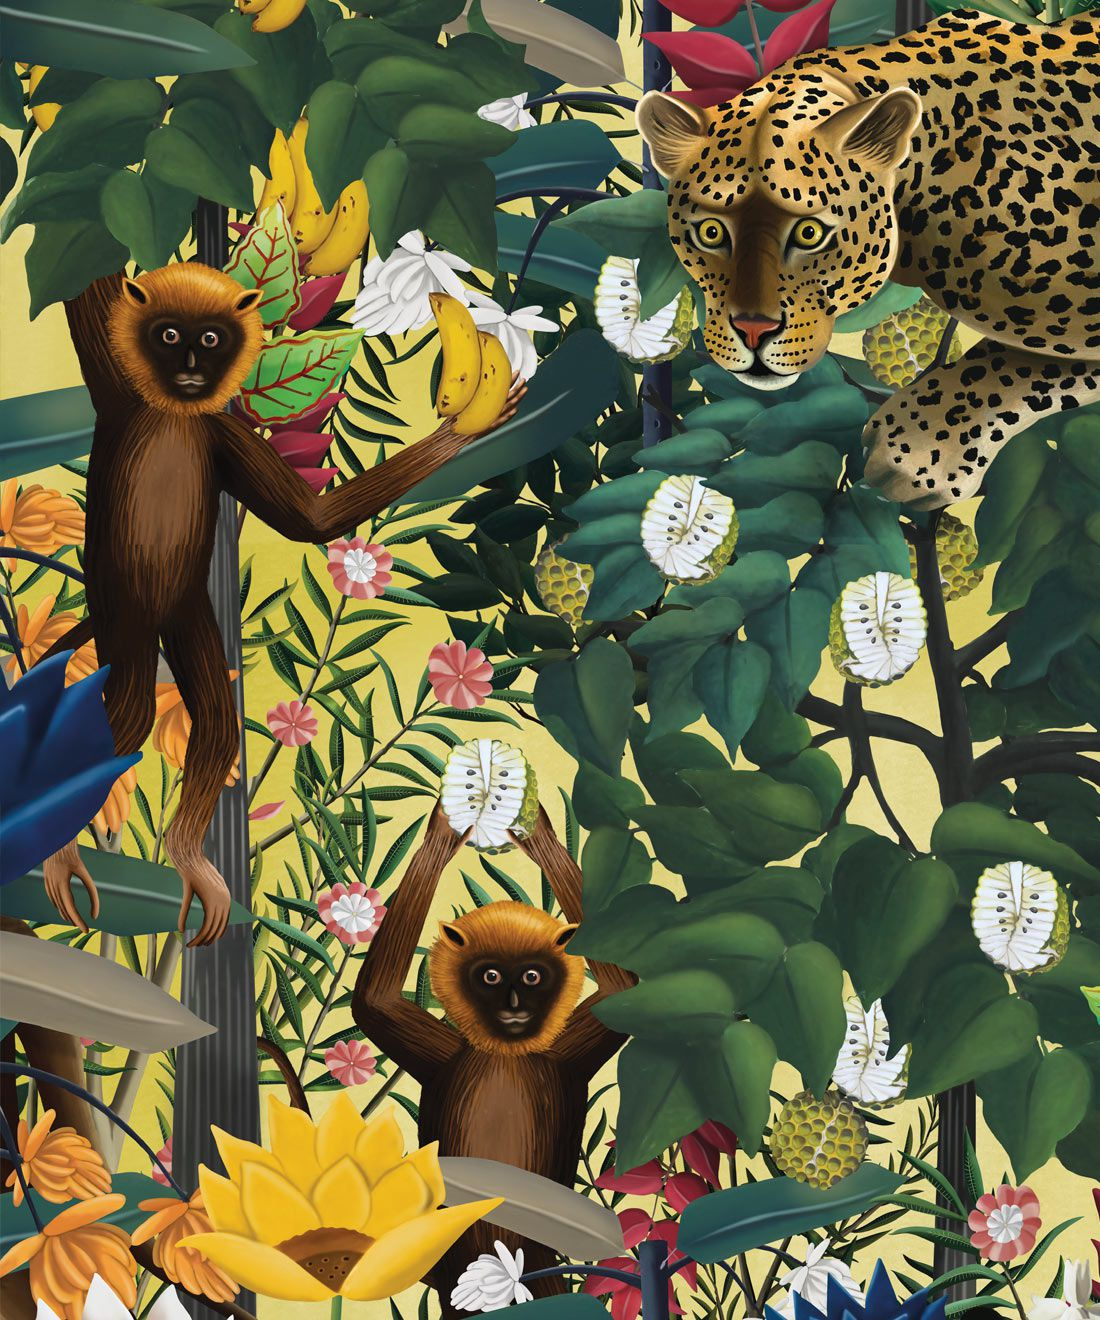 The Jungle Wallpaper • Animal Wallpaper • Botanical Wallpaper • Hazelwood Wallpaper • Swatch